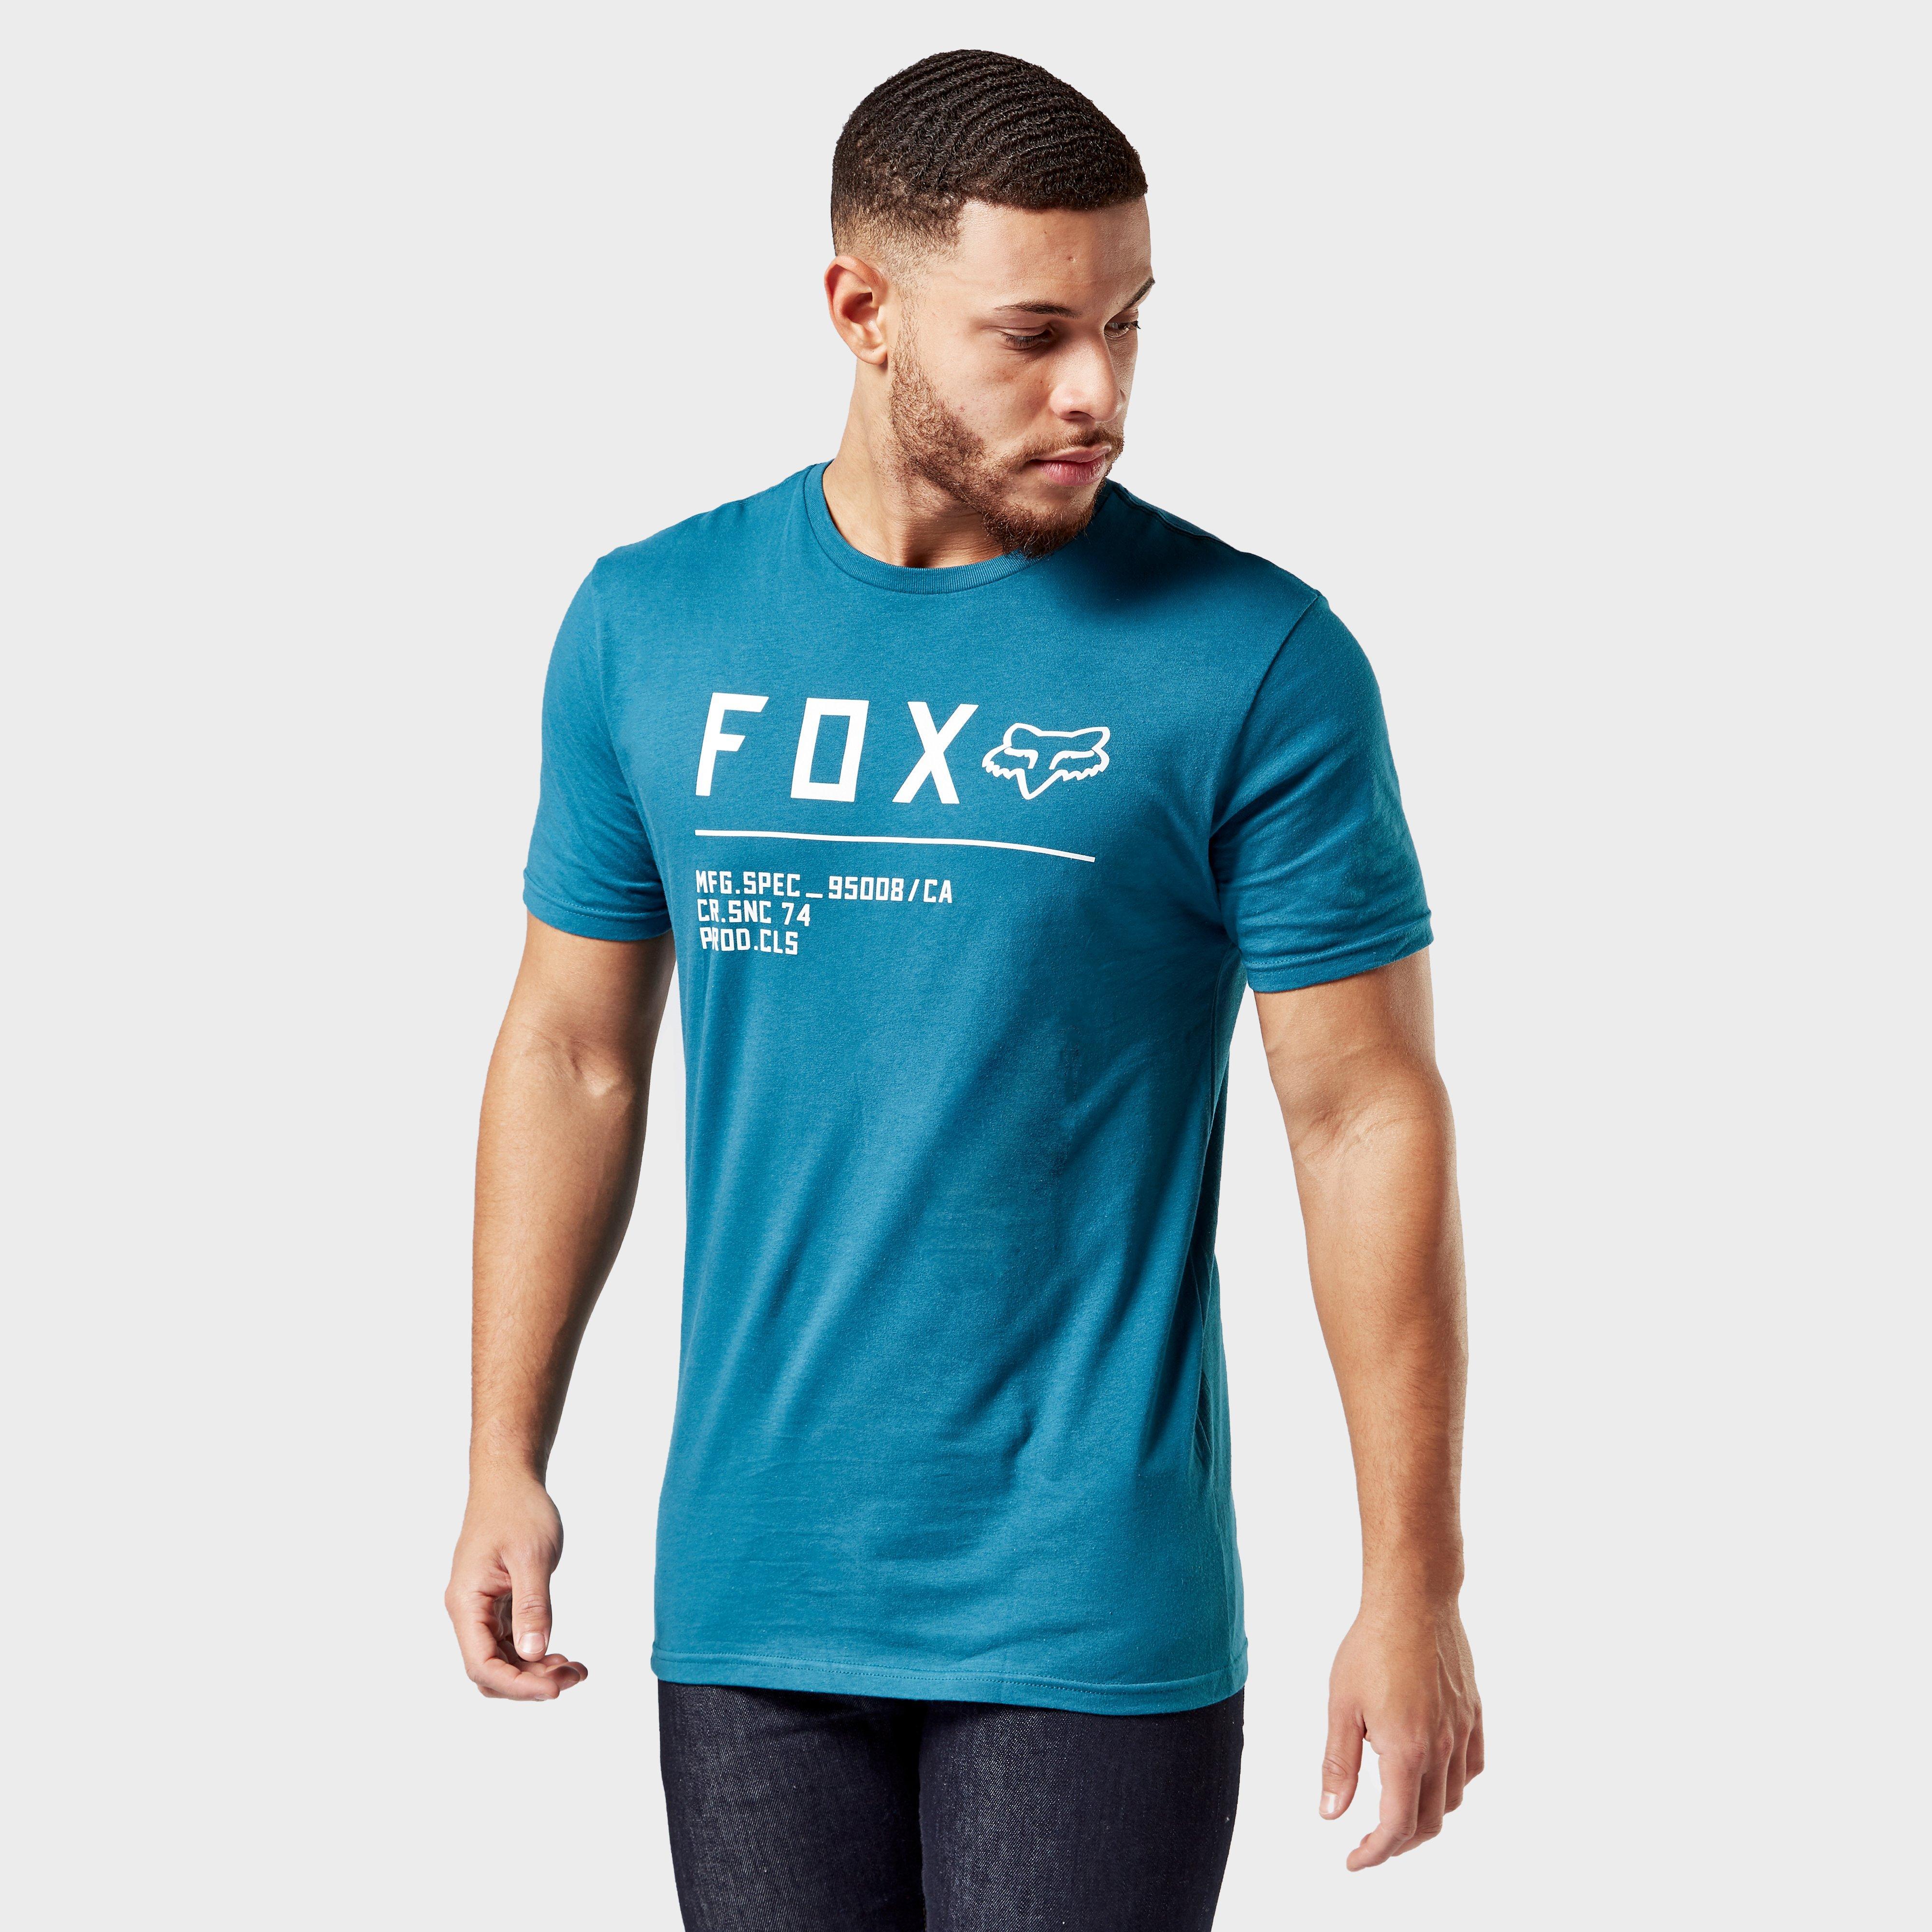 FOX Fox Mens Non Stop Premium Short Sleeve T-Shirt - Blue, Blue